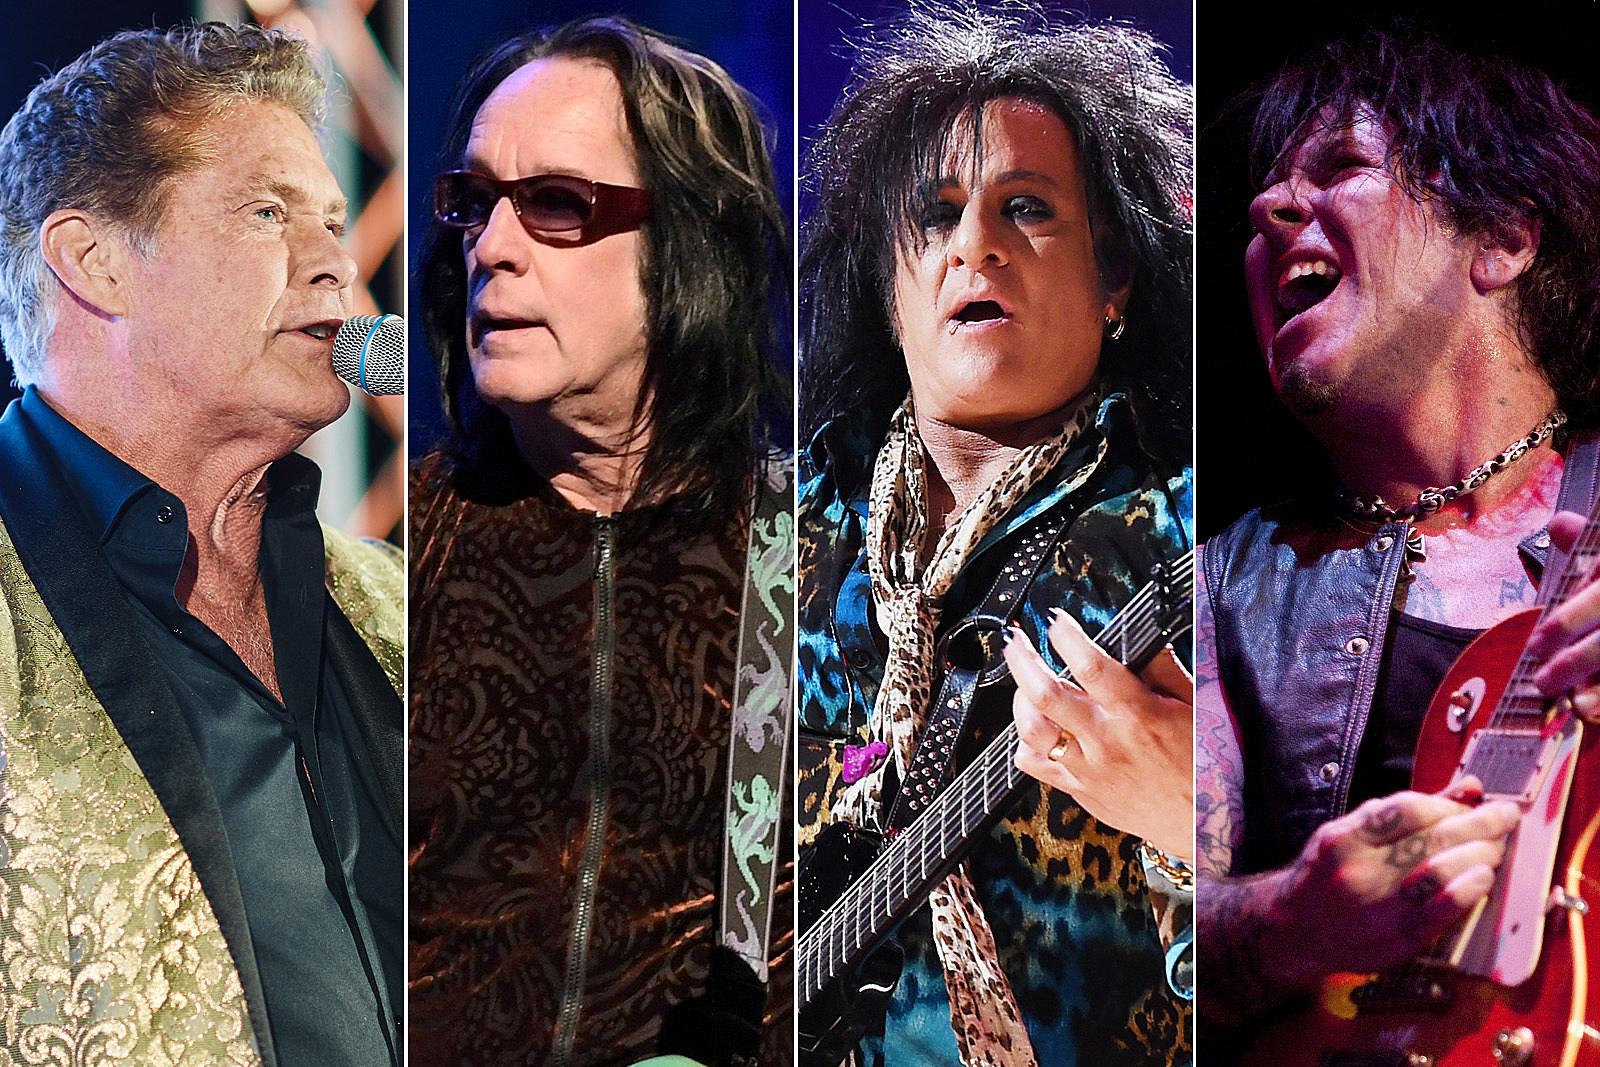 Todd Rundgren, Steve Stevens, Tracii Guns Appear on New David Hasselhoff Album